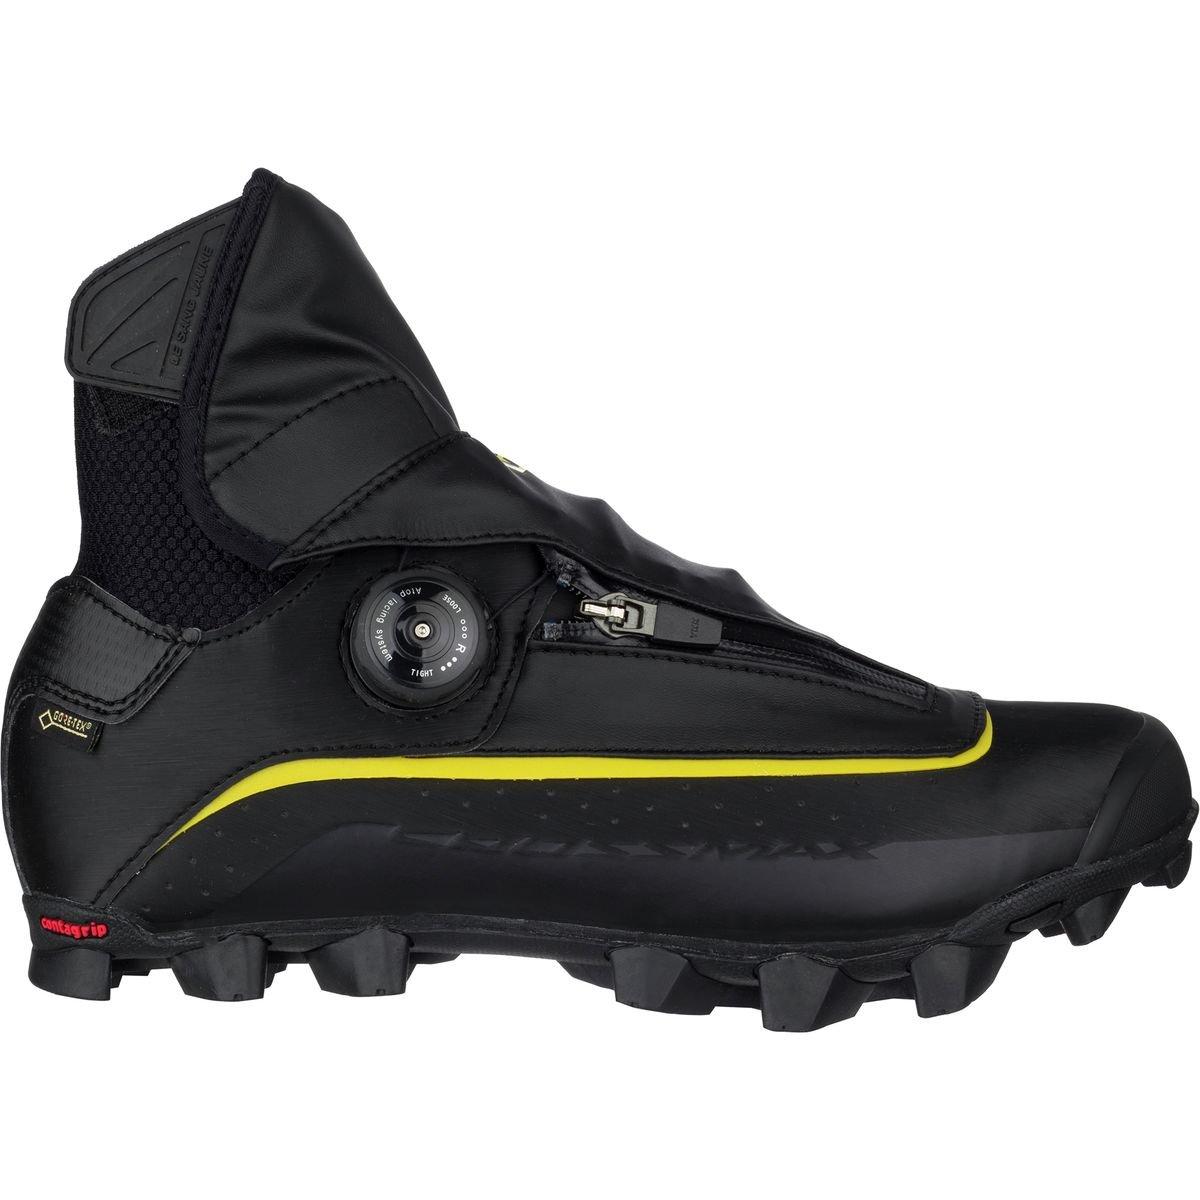 Mavic Crossmax SL Pro Thermo Cycling Shoe - Men's Black, US 12.0/UK 11.5 by Mavic